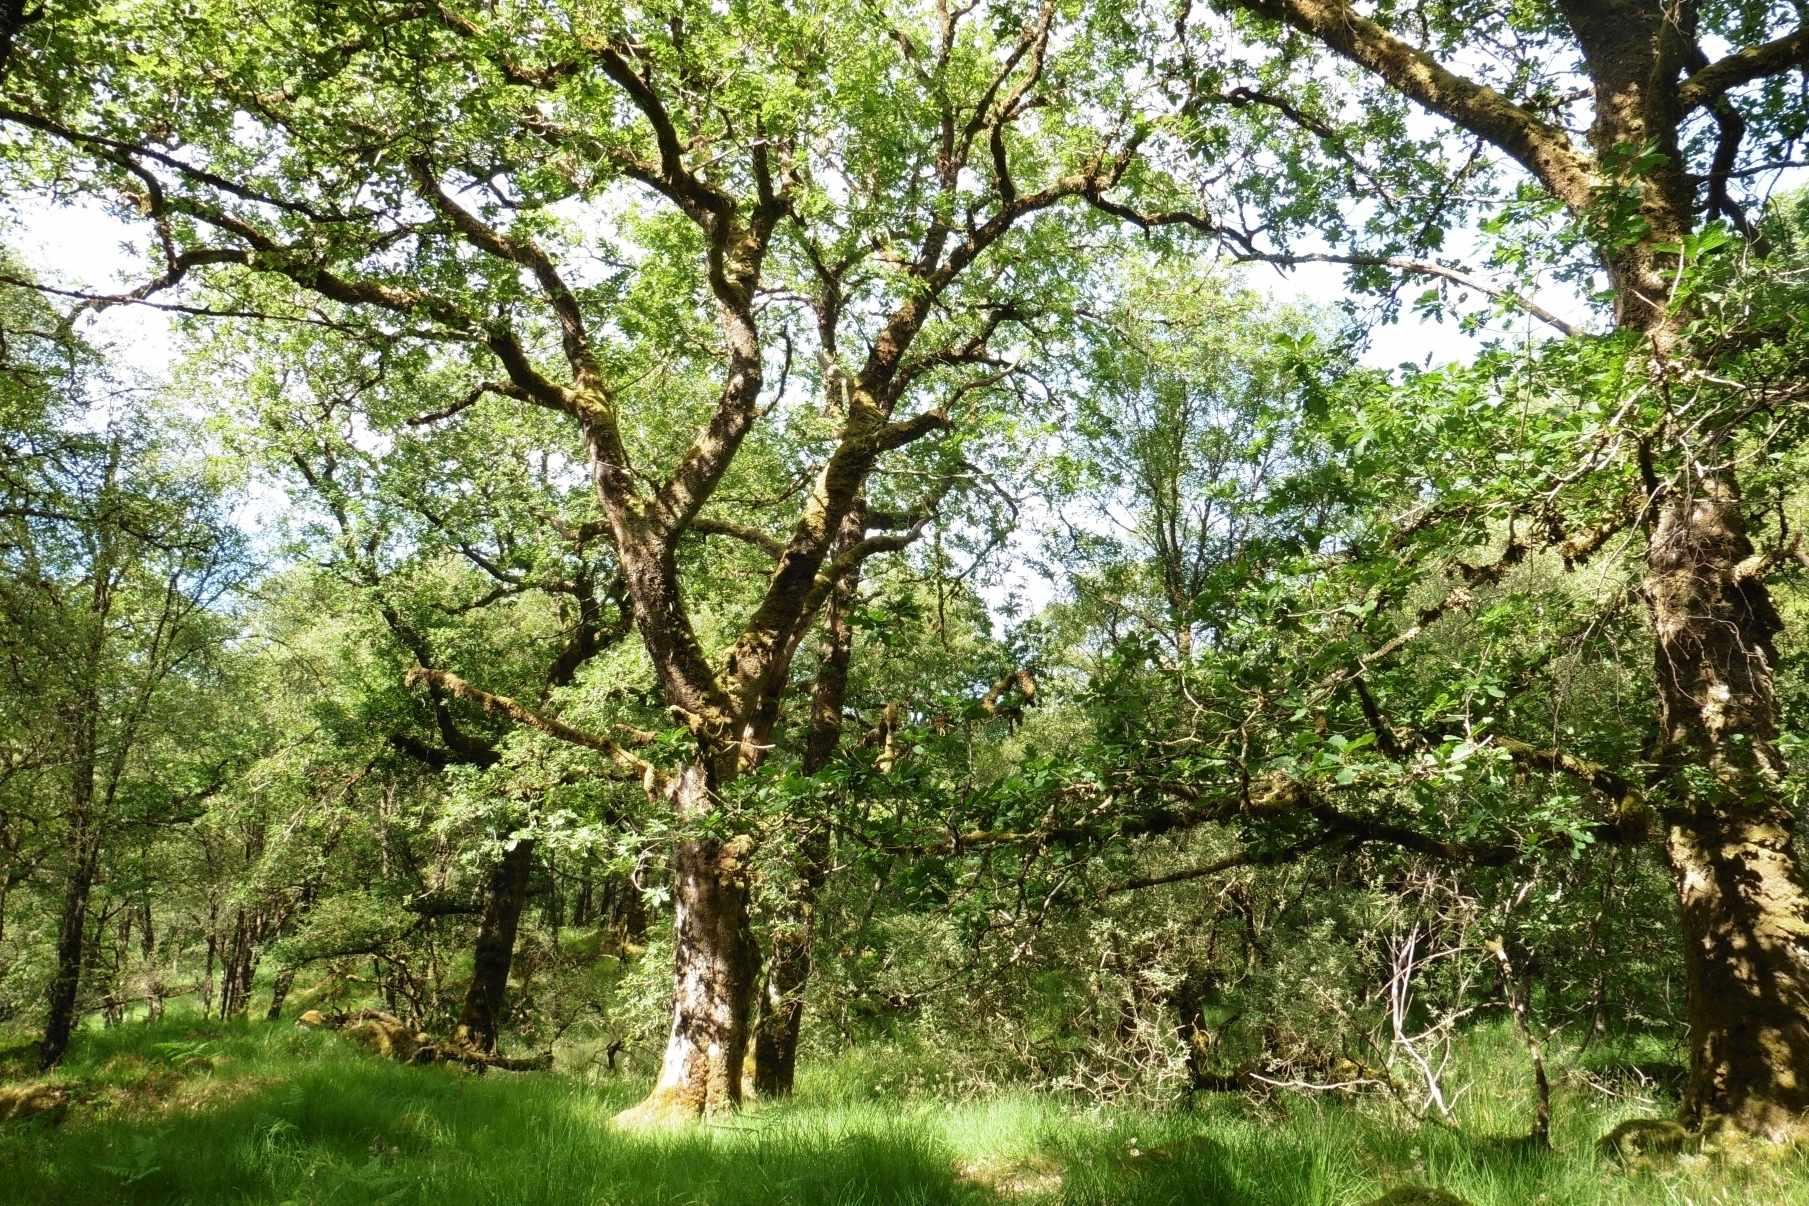 British oak trees